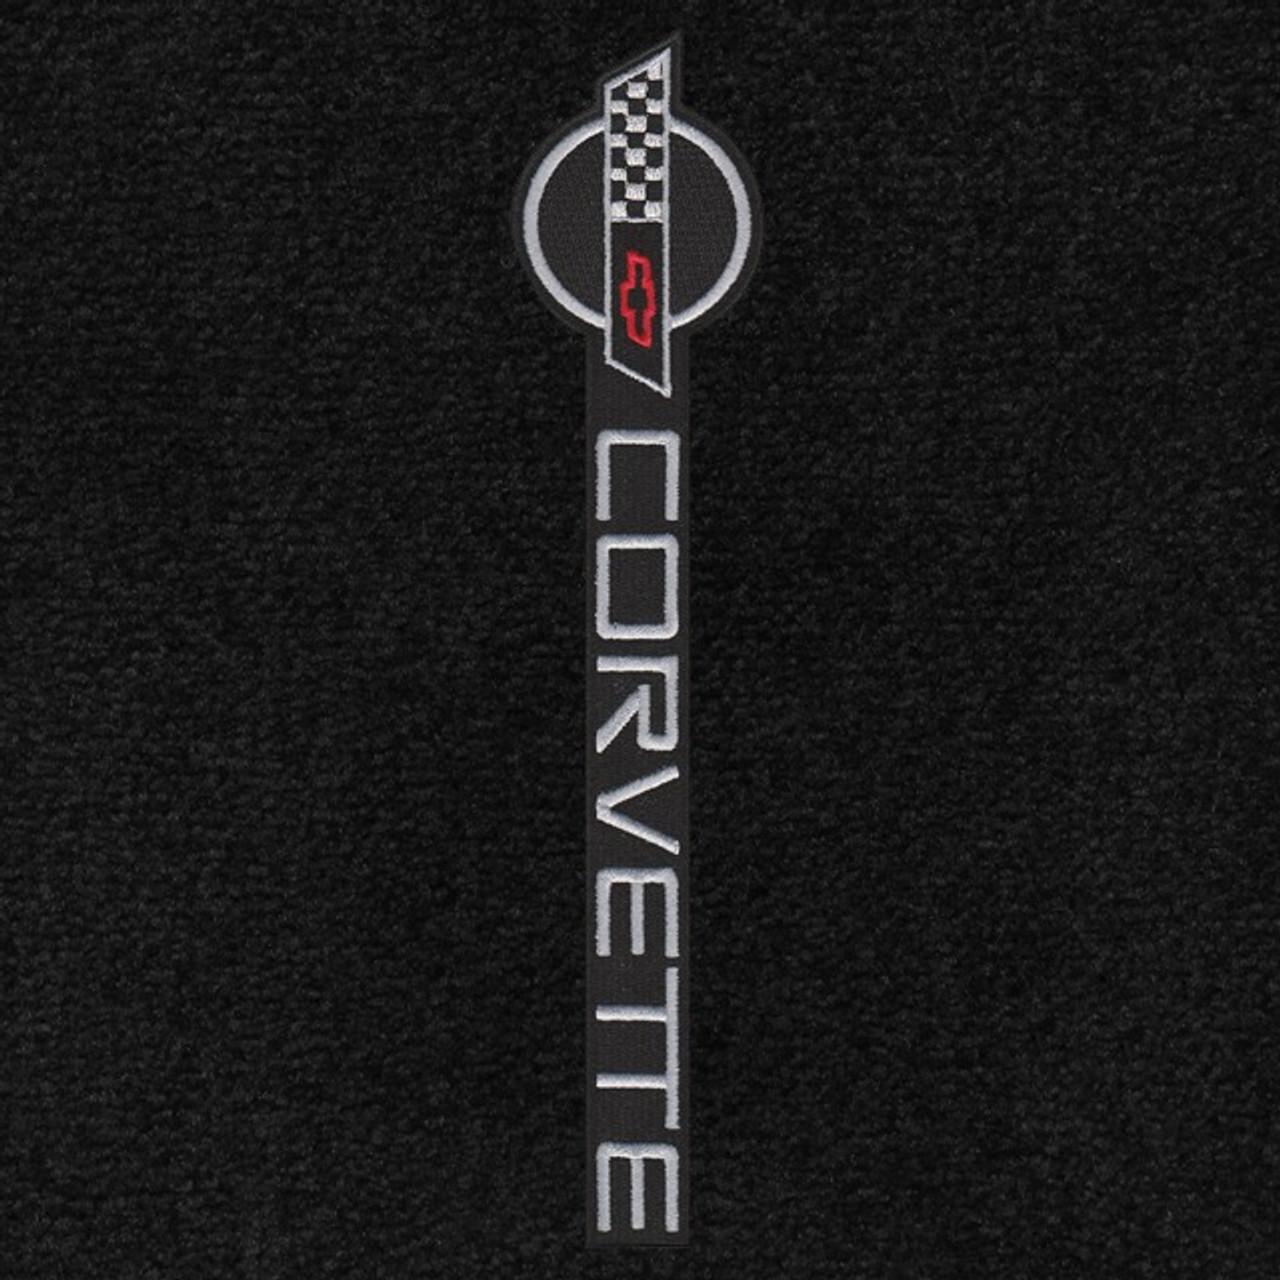 C4 Corvette Logo/Lettering (91-96) sideways facing door sill